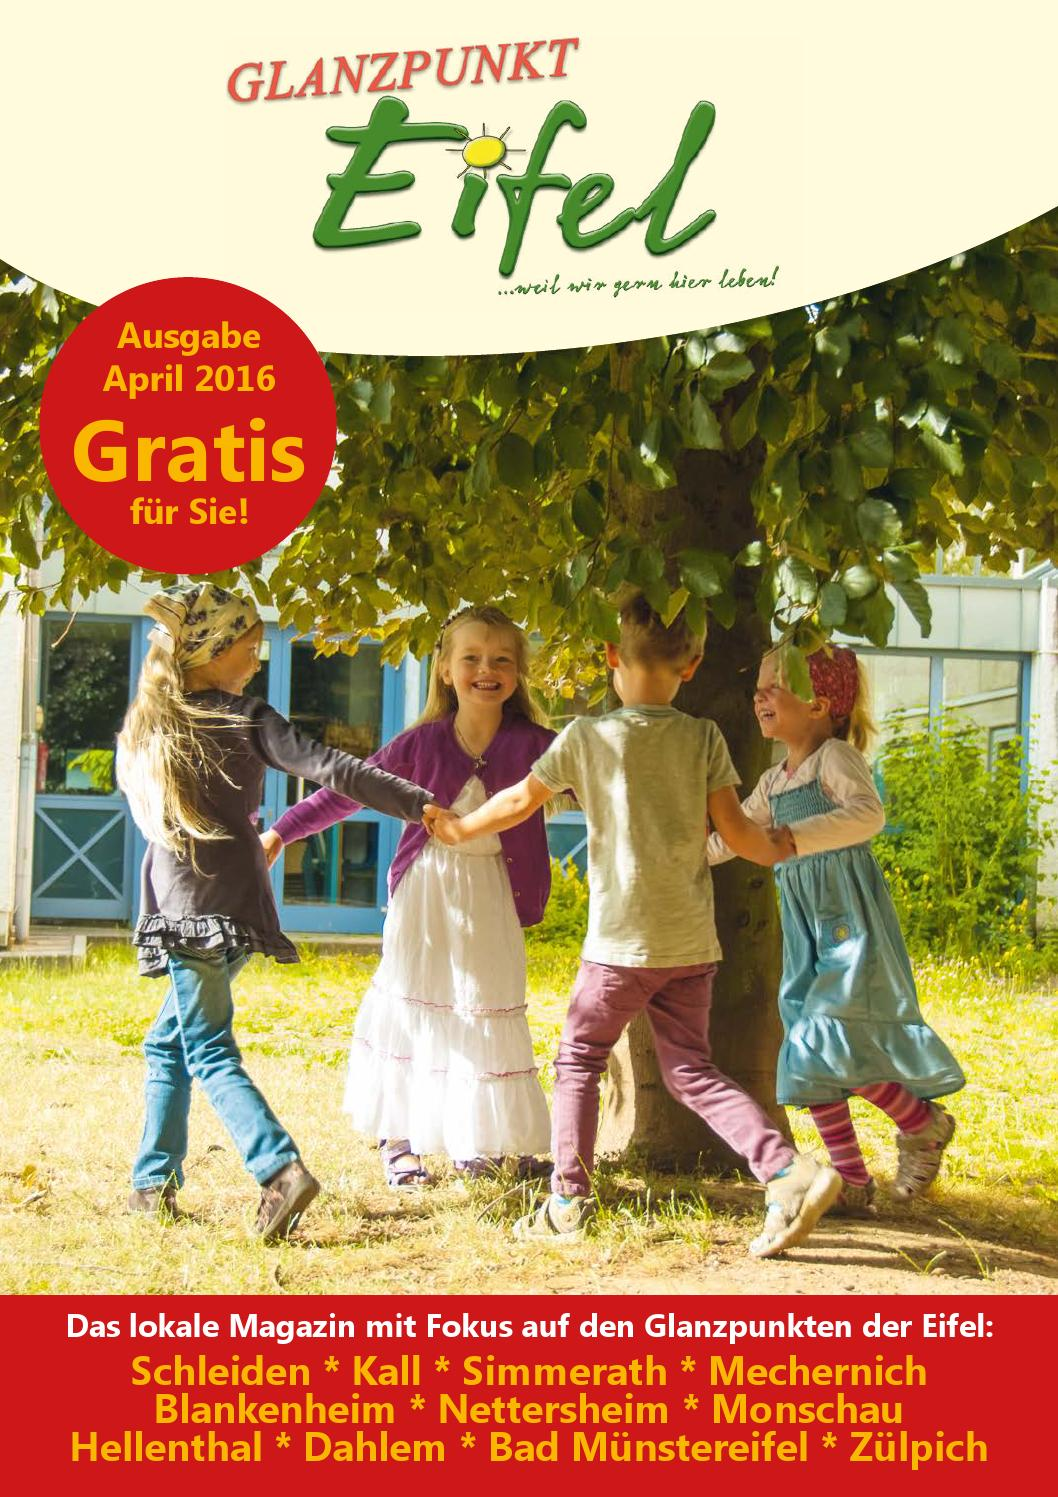 Glanzpunkt Eifel Ausgabe April 2016 By Glanzpunkt Eifel Issuu